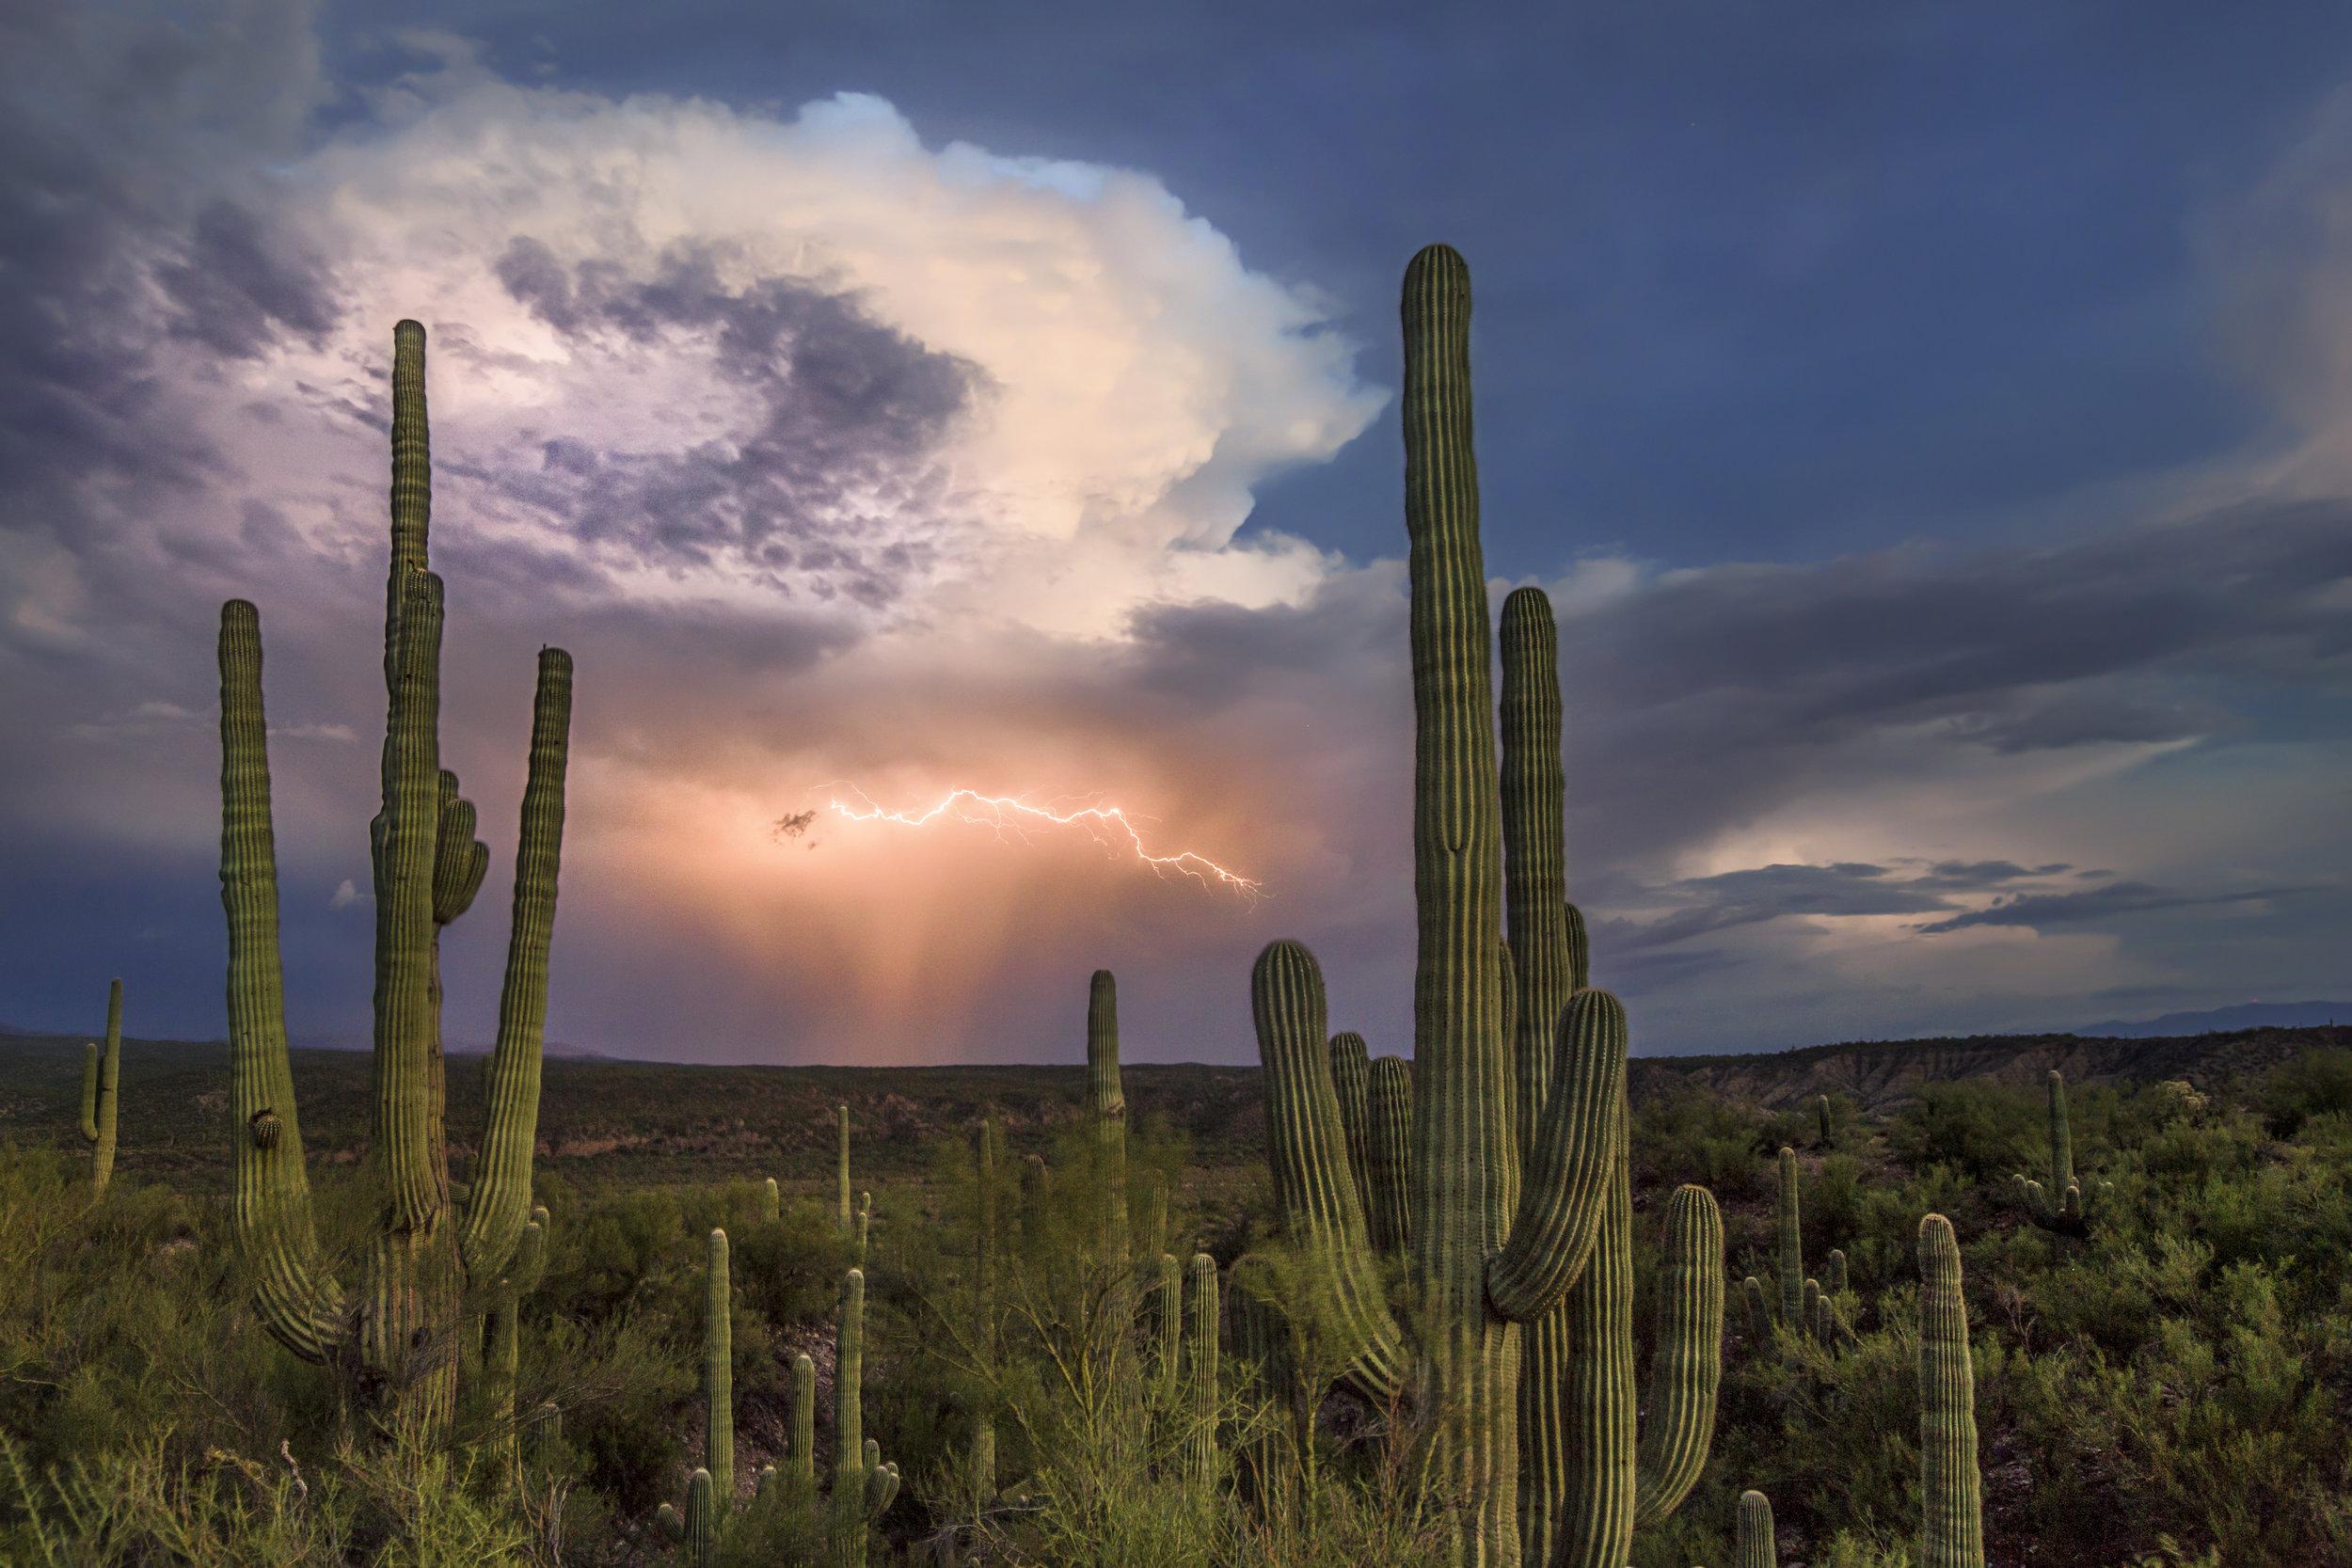 Thunderstorm approaching Christmas, Arizona. July 31, 2016